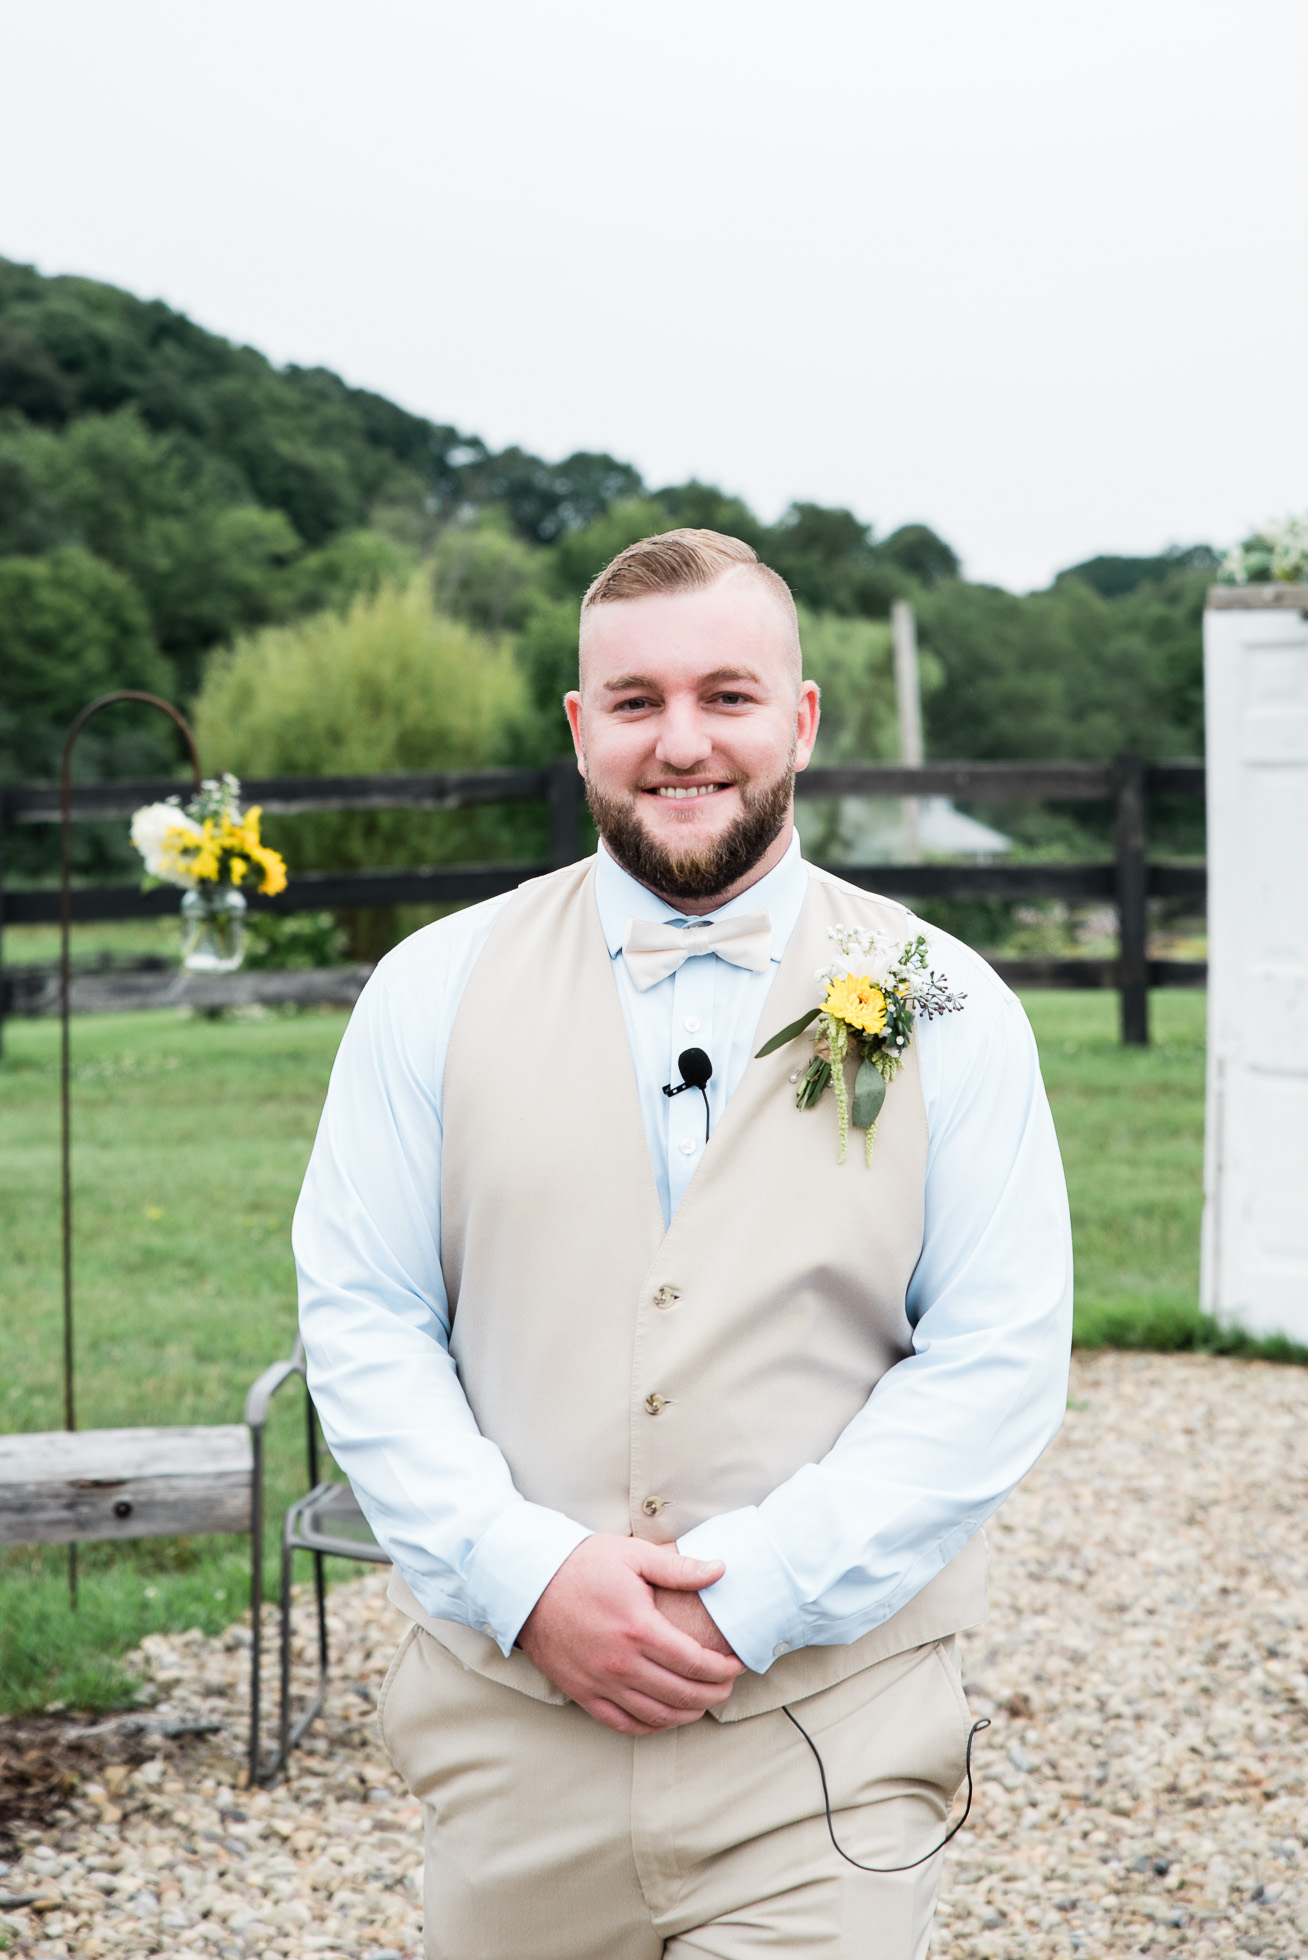 The Hayloft of PA, wedding ceremony Mariah Fisher, Pittsburgh PA wedding photographer-11.jpg